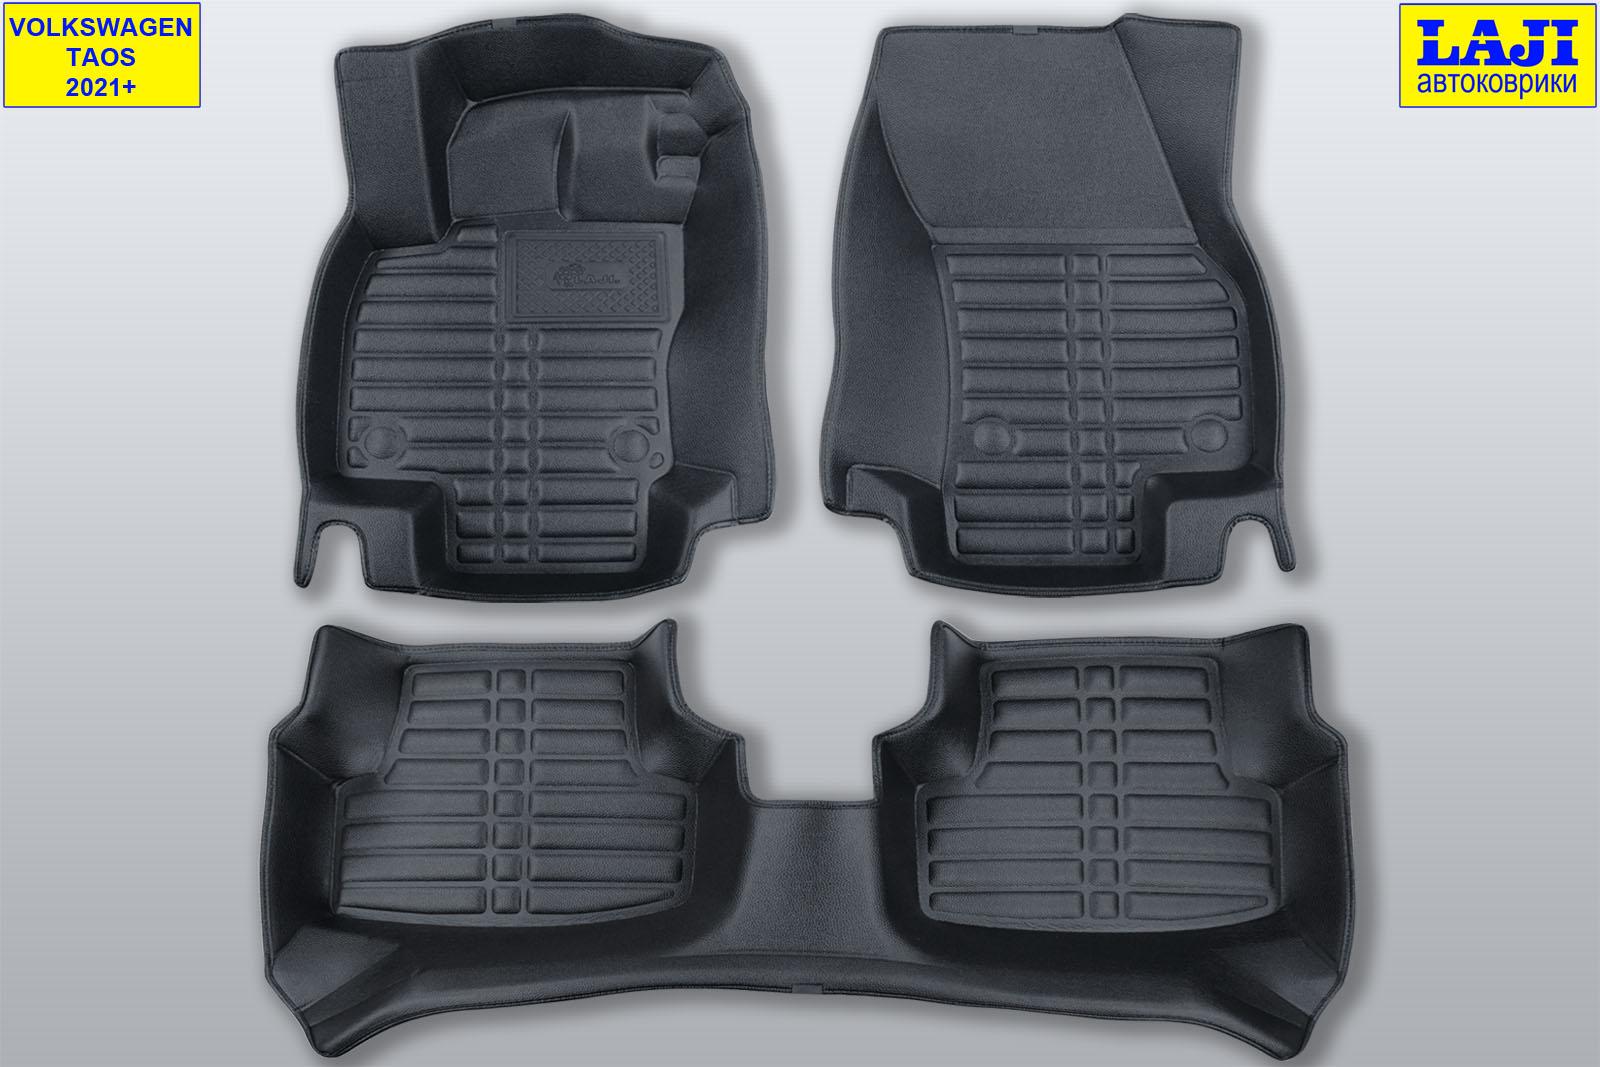 5D коврики в салон Volkswagen Taos 2021-н.в. 1